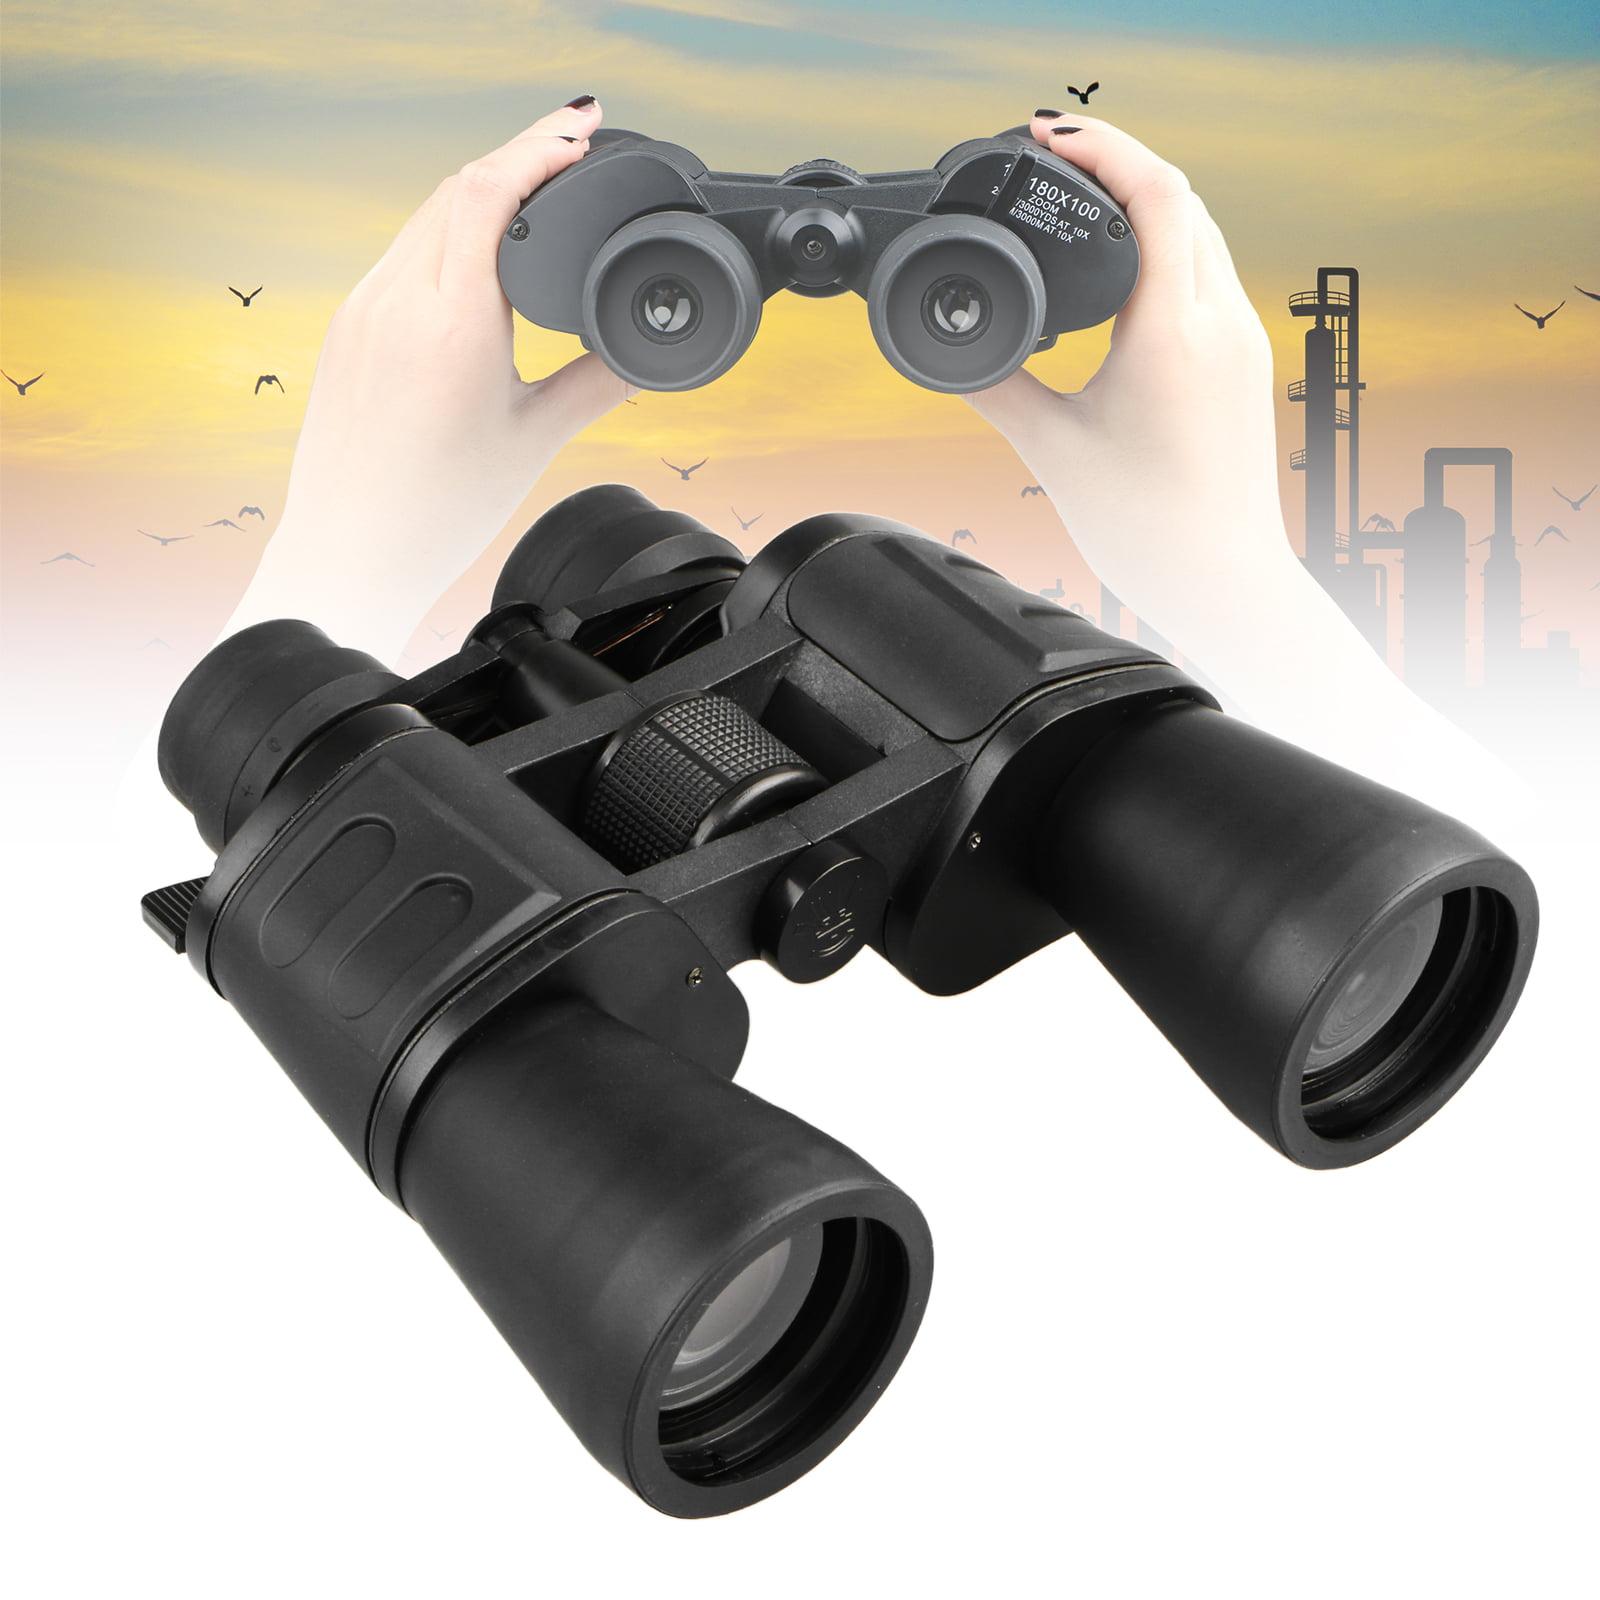 Quick Focus Binoculars, EEEKit 180x100 Waterproof Wide Angle Telescope with Low Night Vision for Outdoor Hunting, Camping, Bird Watching, Traveling